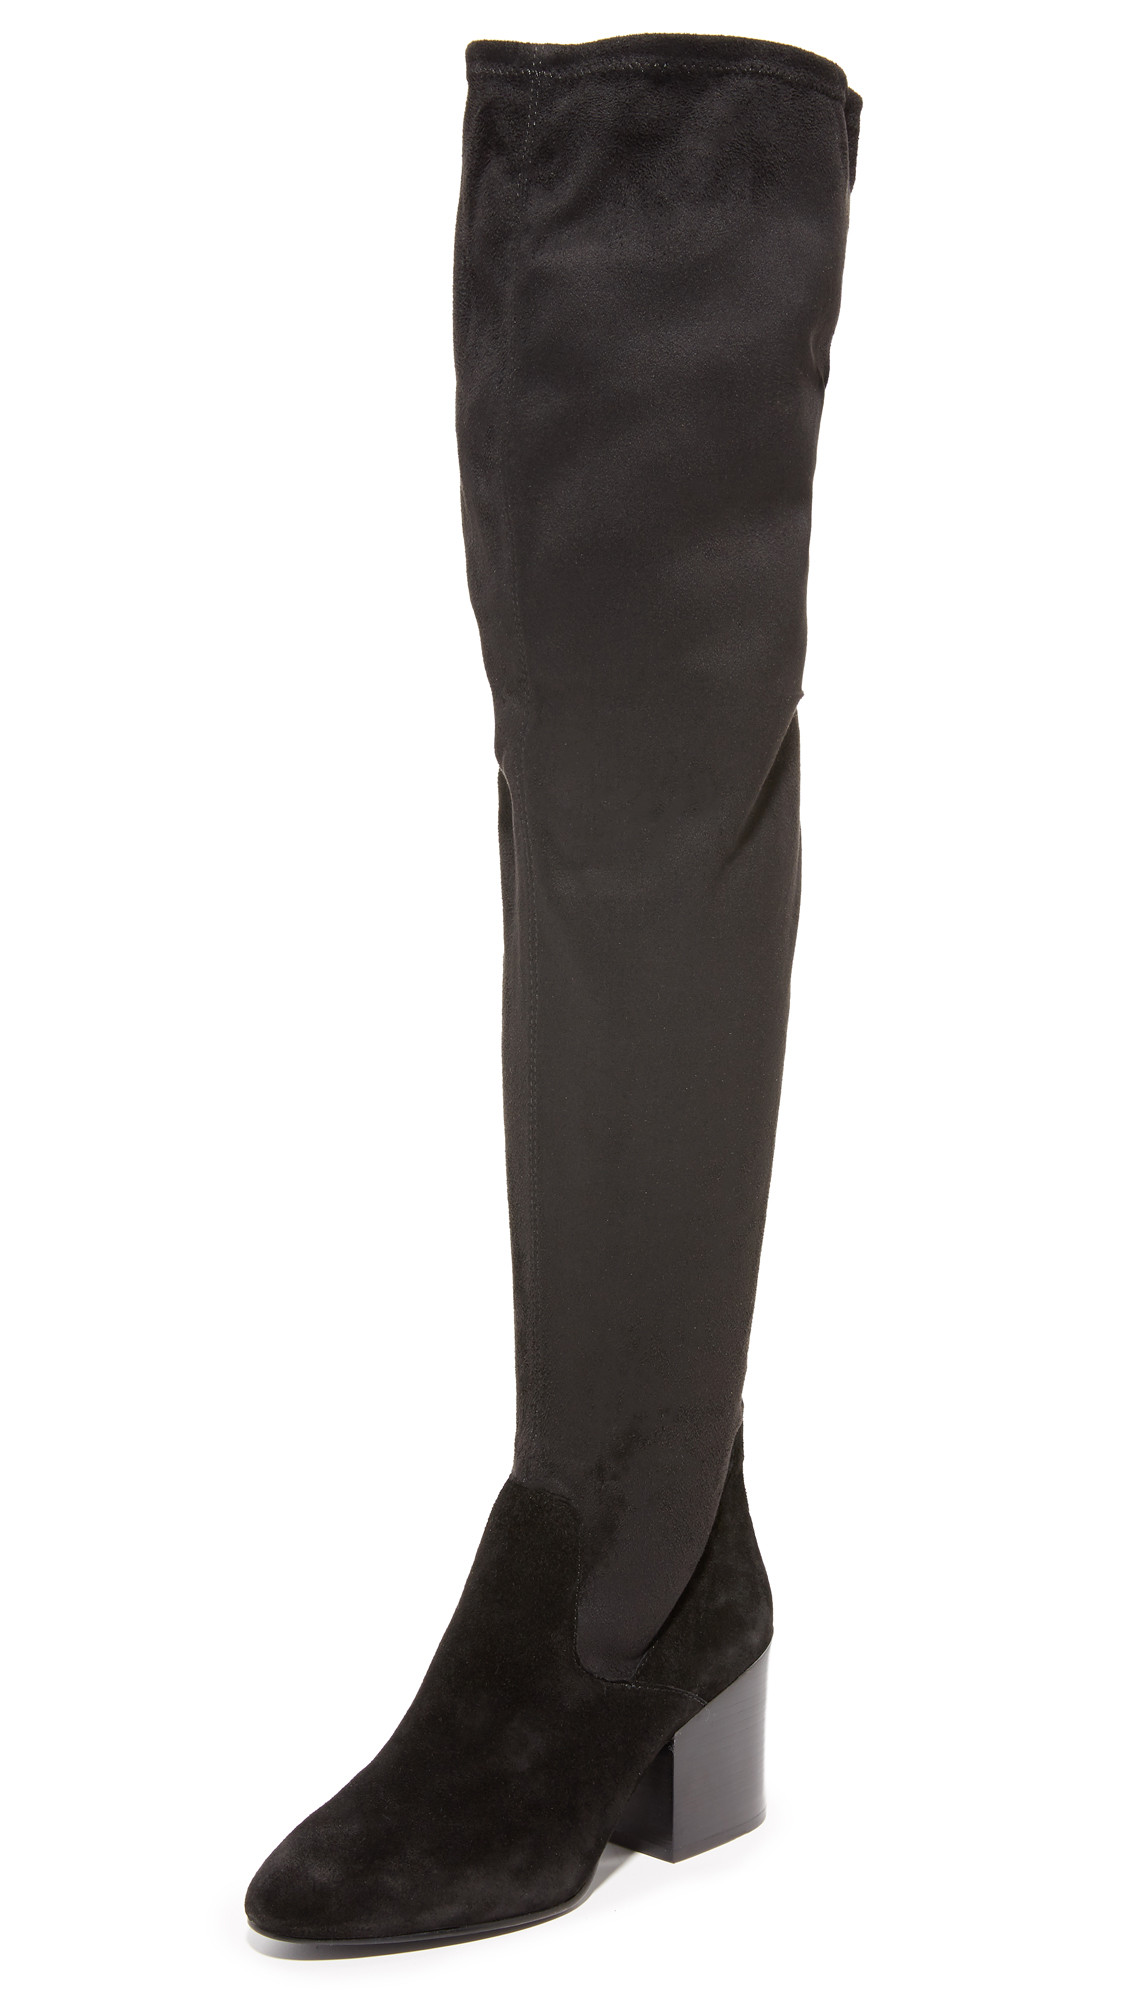 Ash Elisa Thigh High Boots - Black